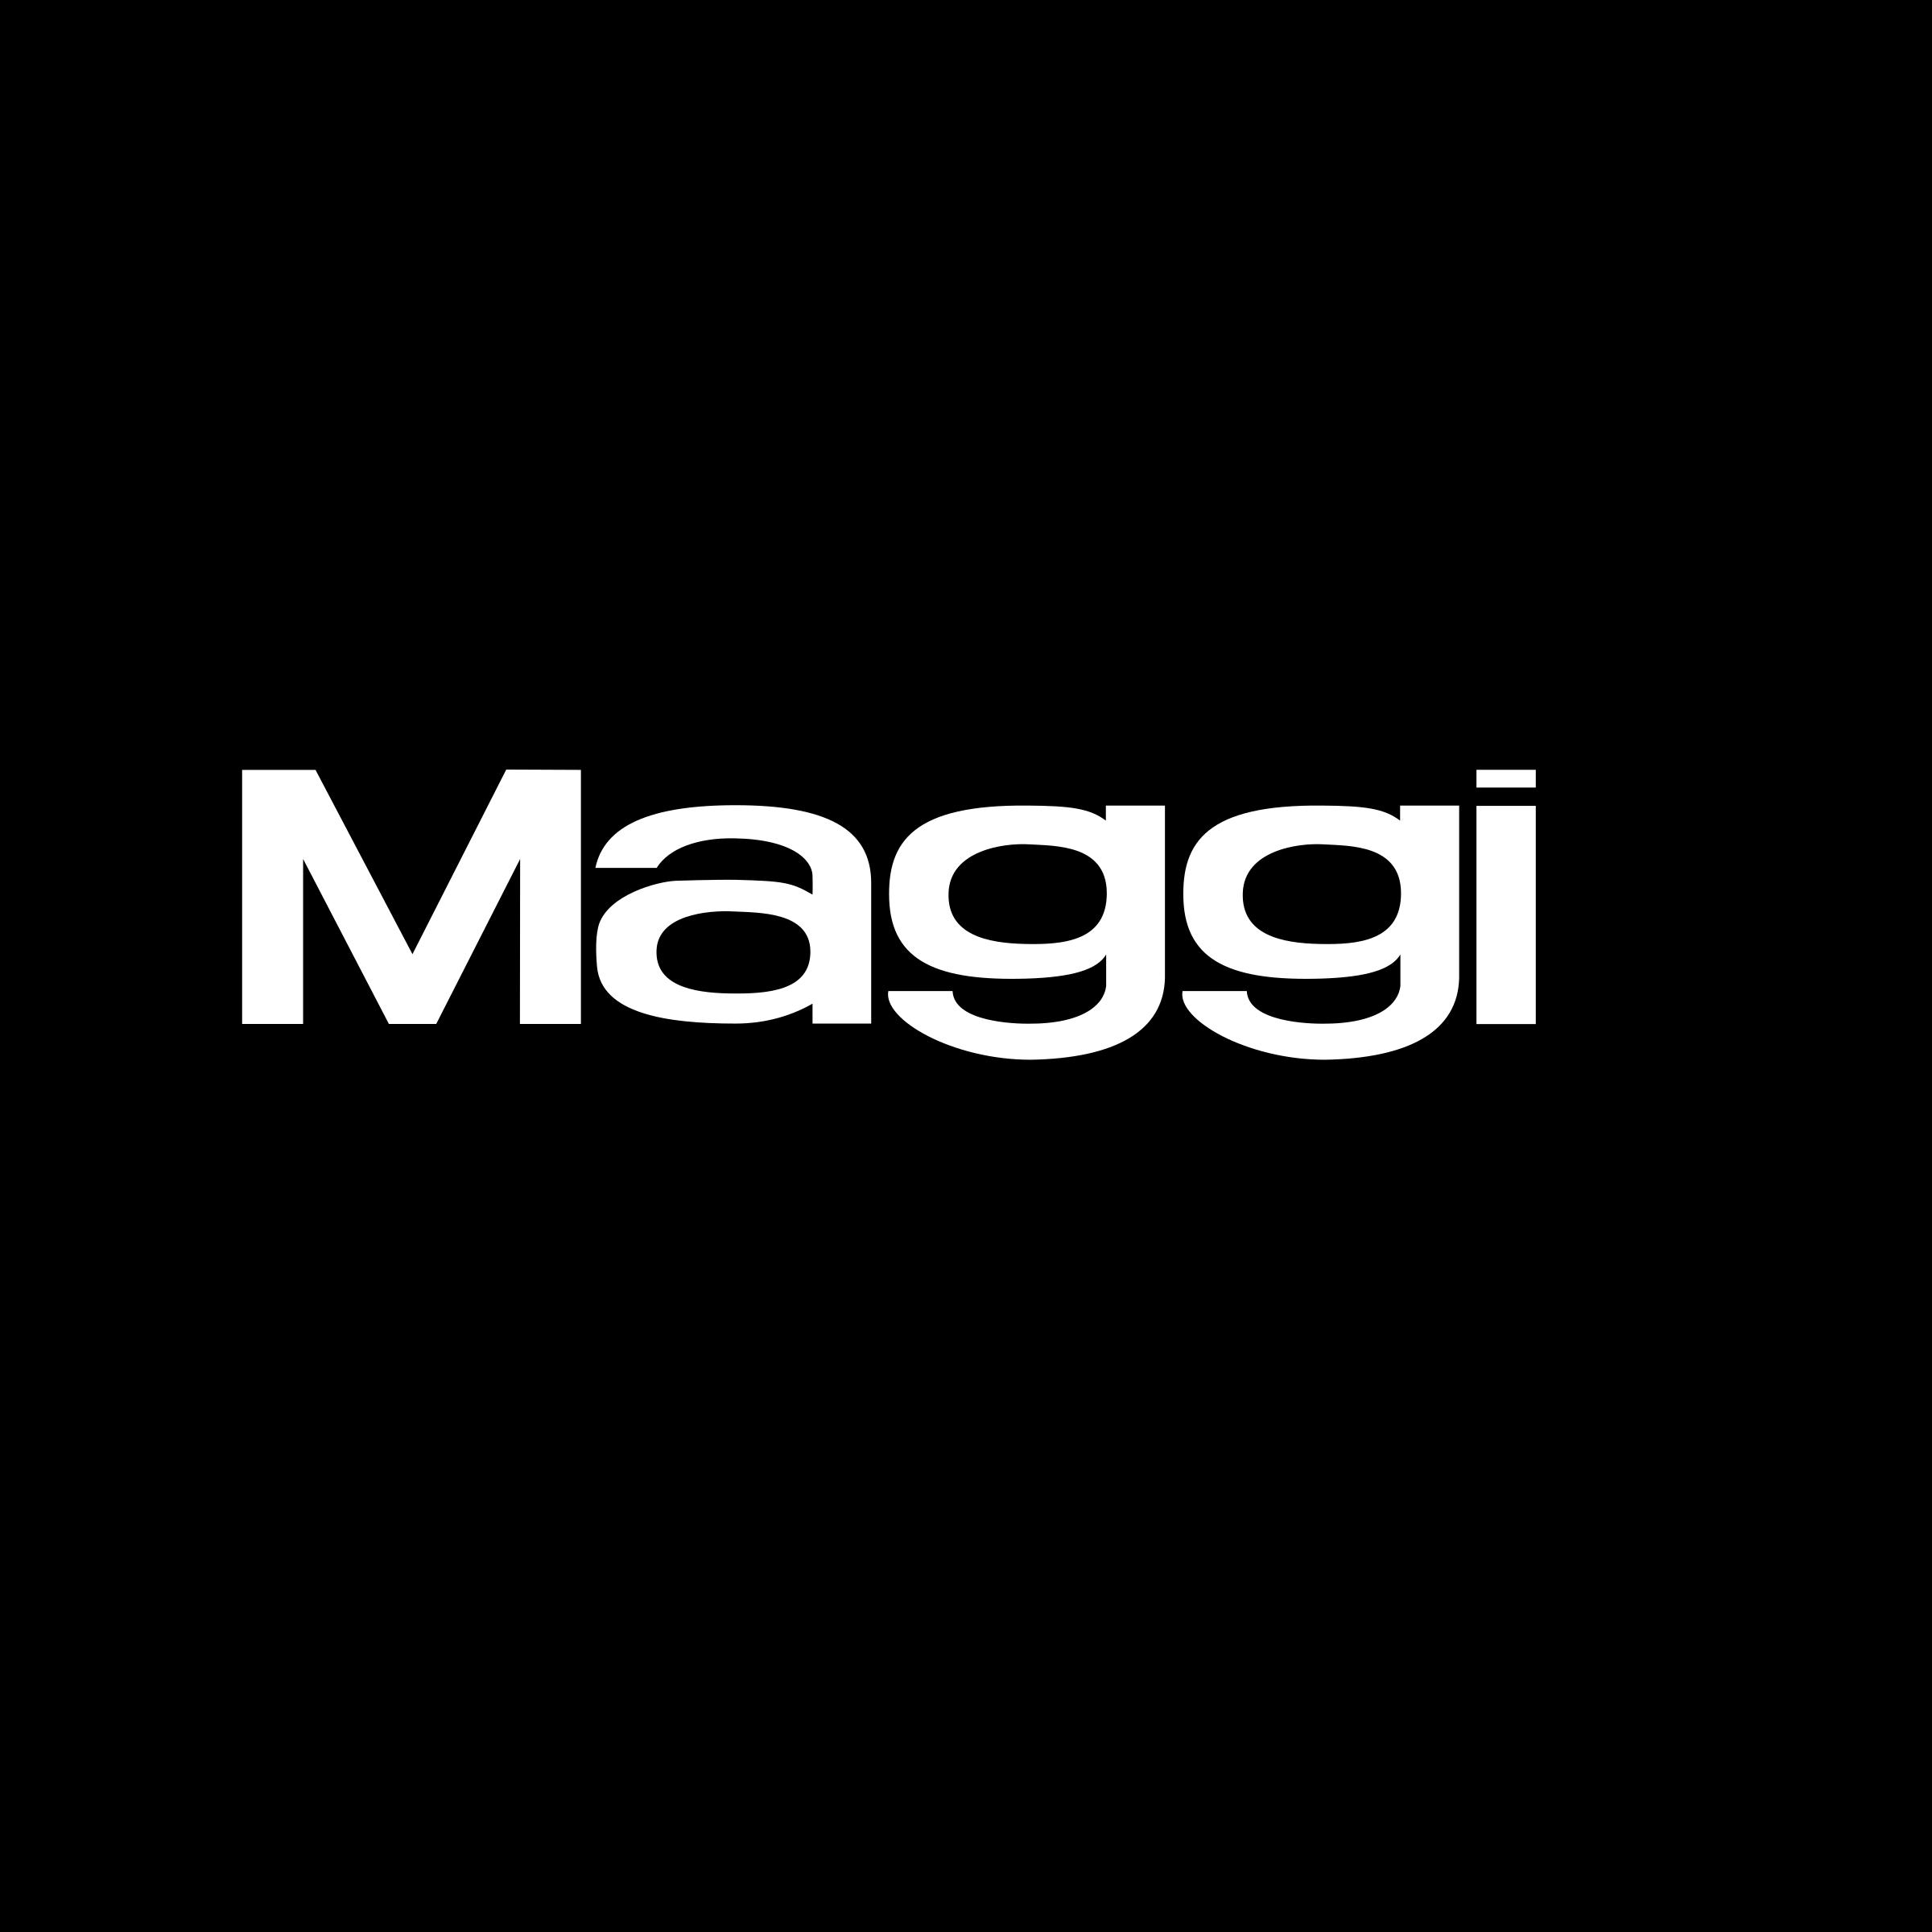 Maggi logo  Maggi Logo PNG Transparent & SVG Vector - Freebie Supply